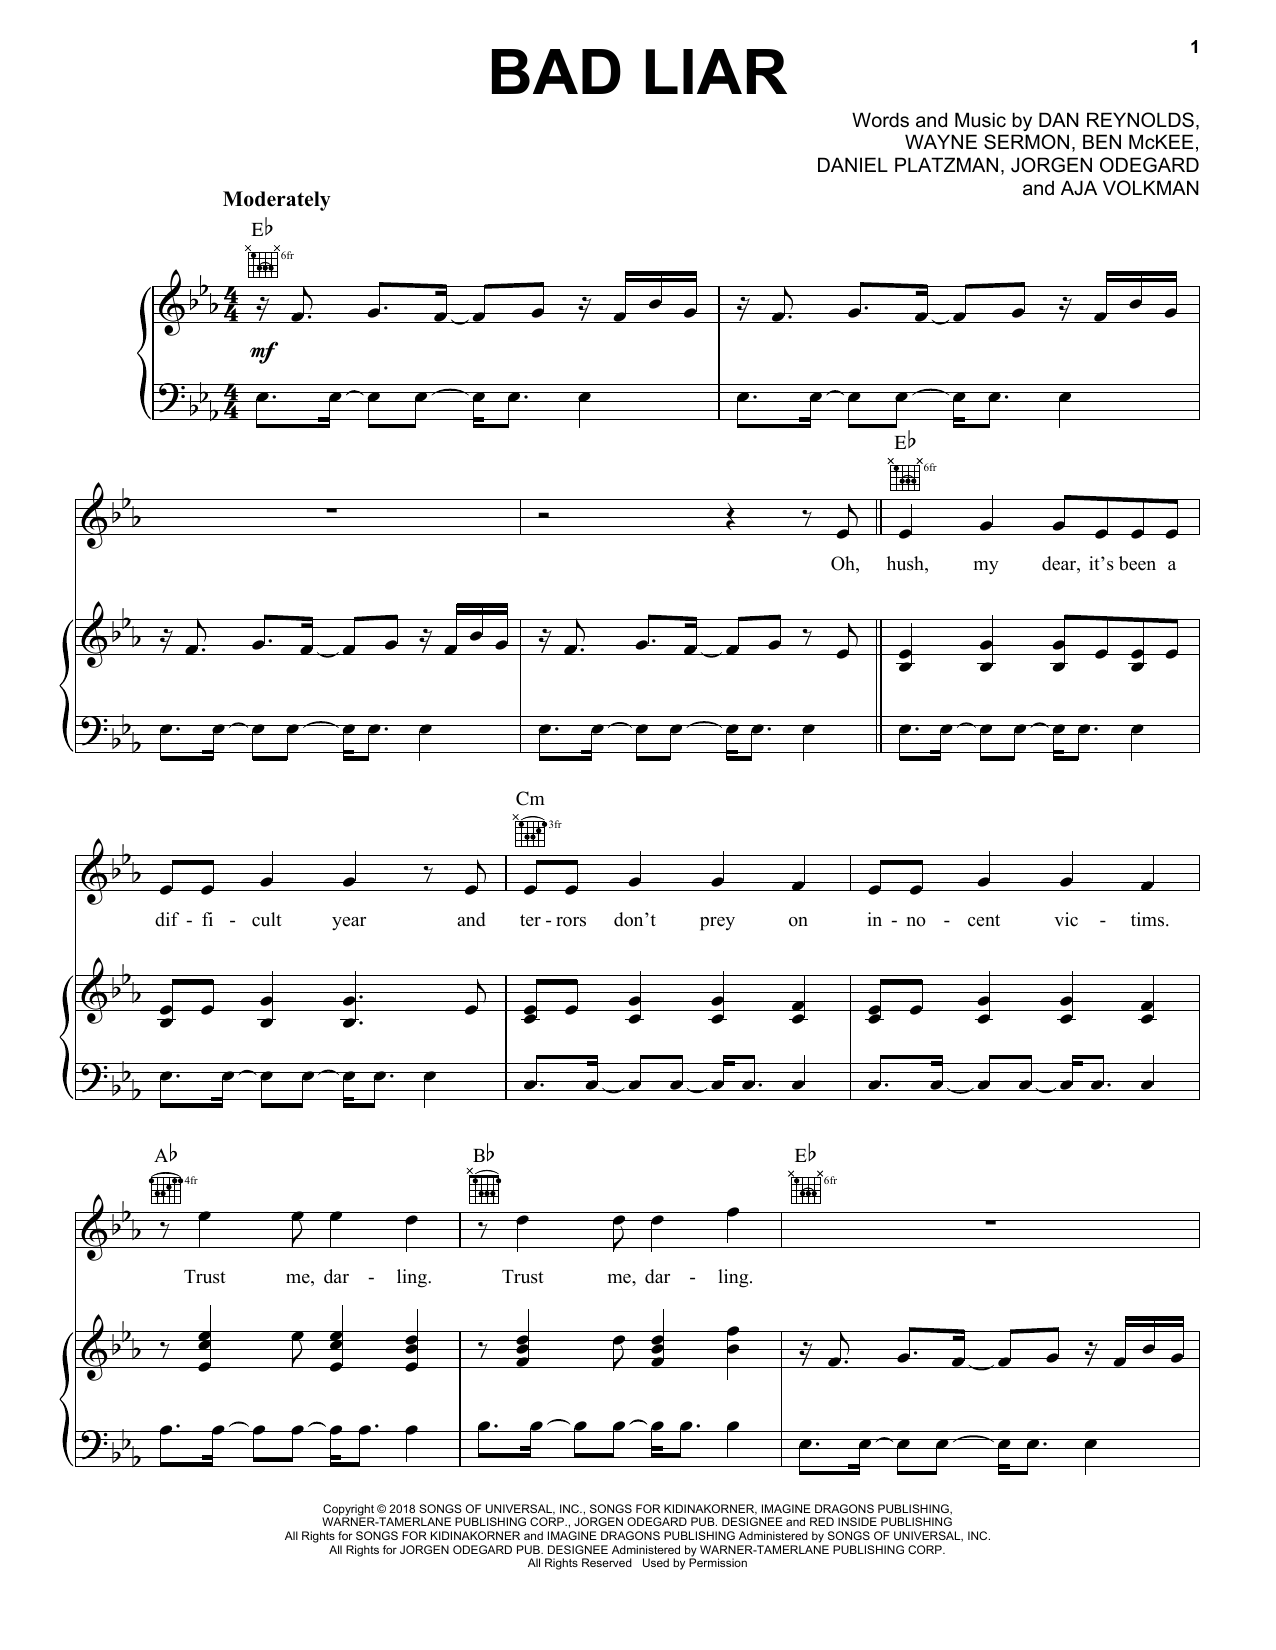 Imagine Dragons Bad Liar sheet music notes and chords